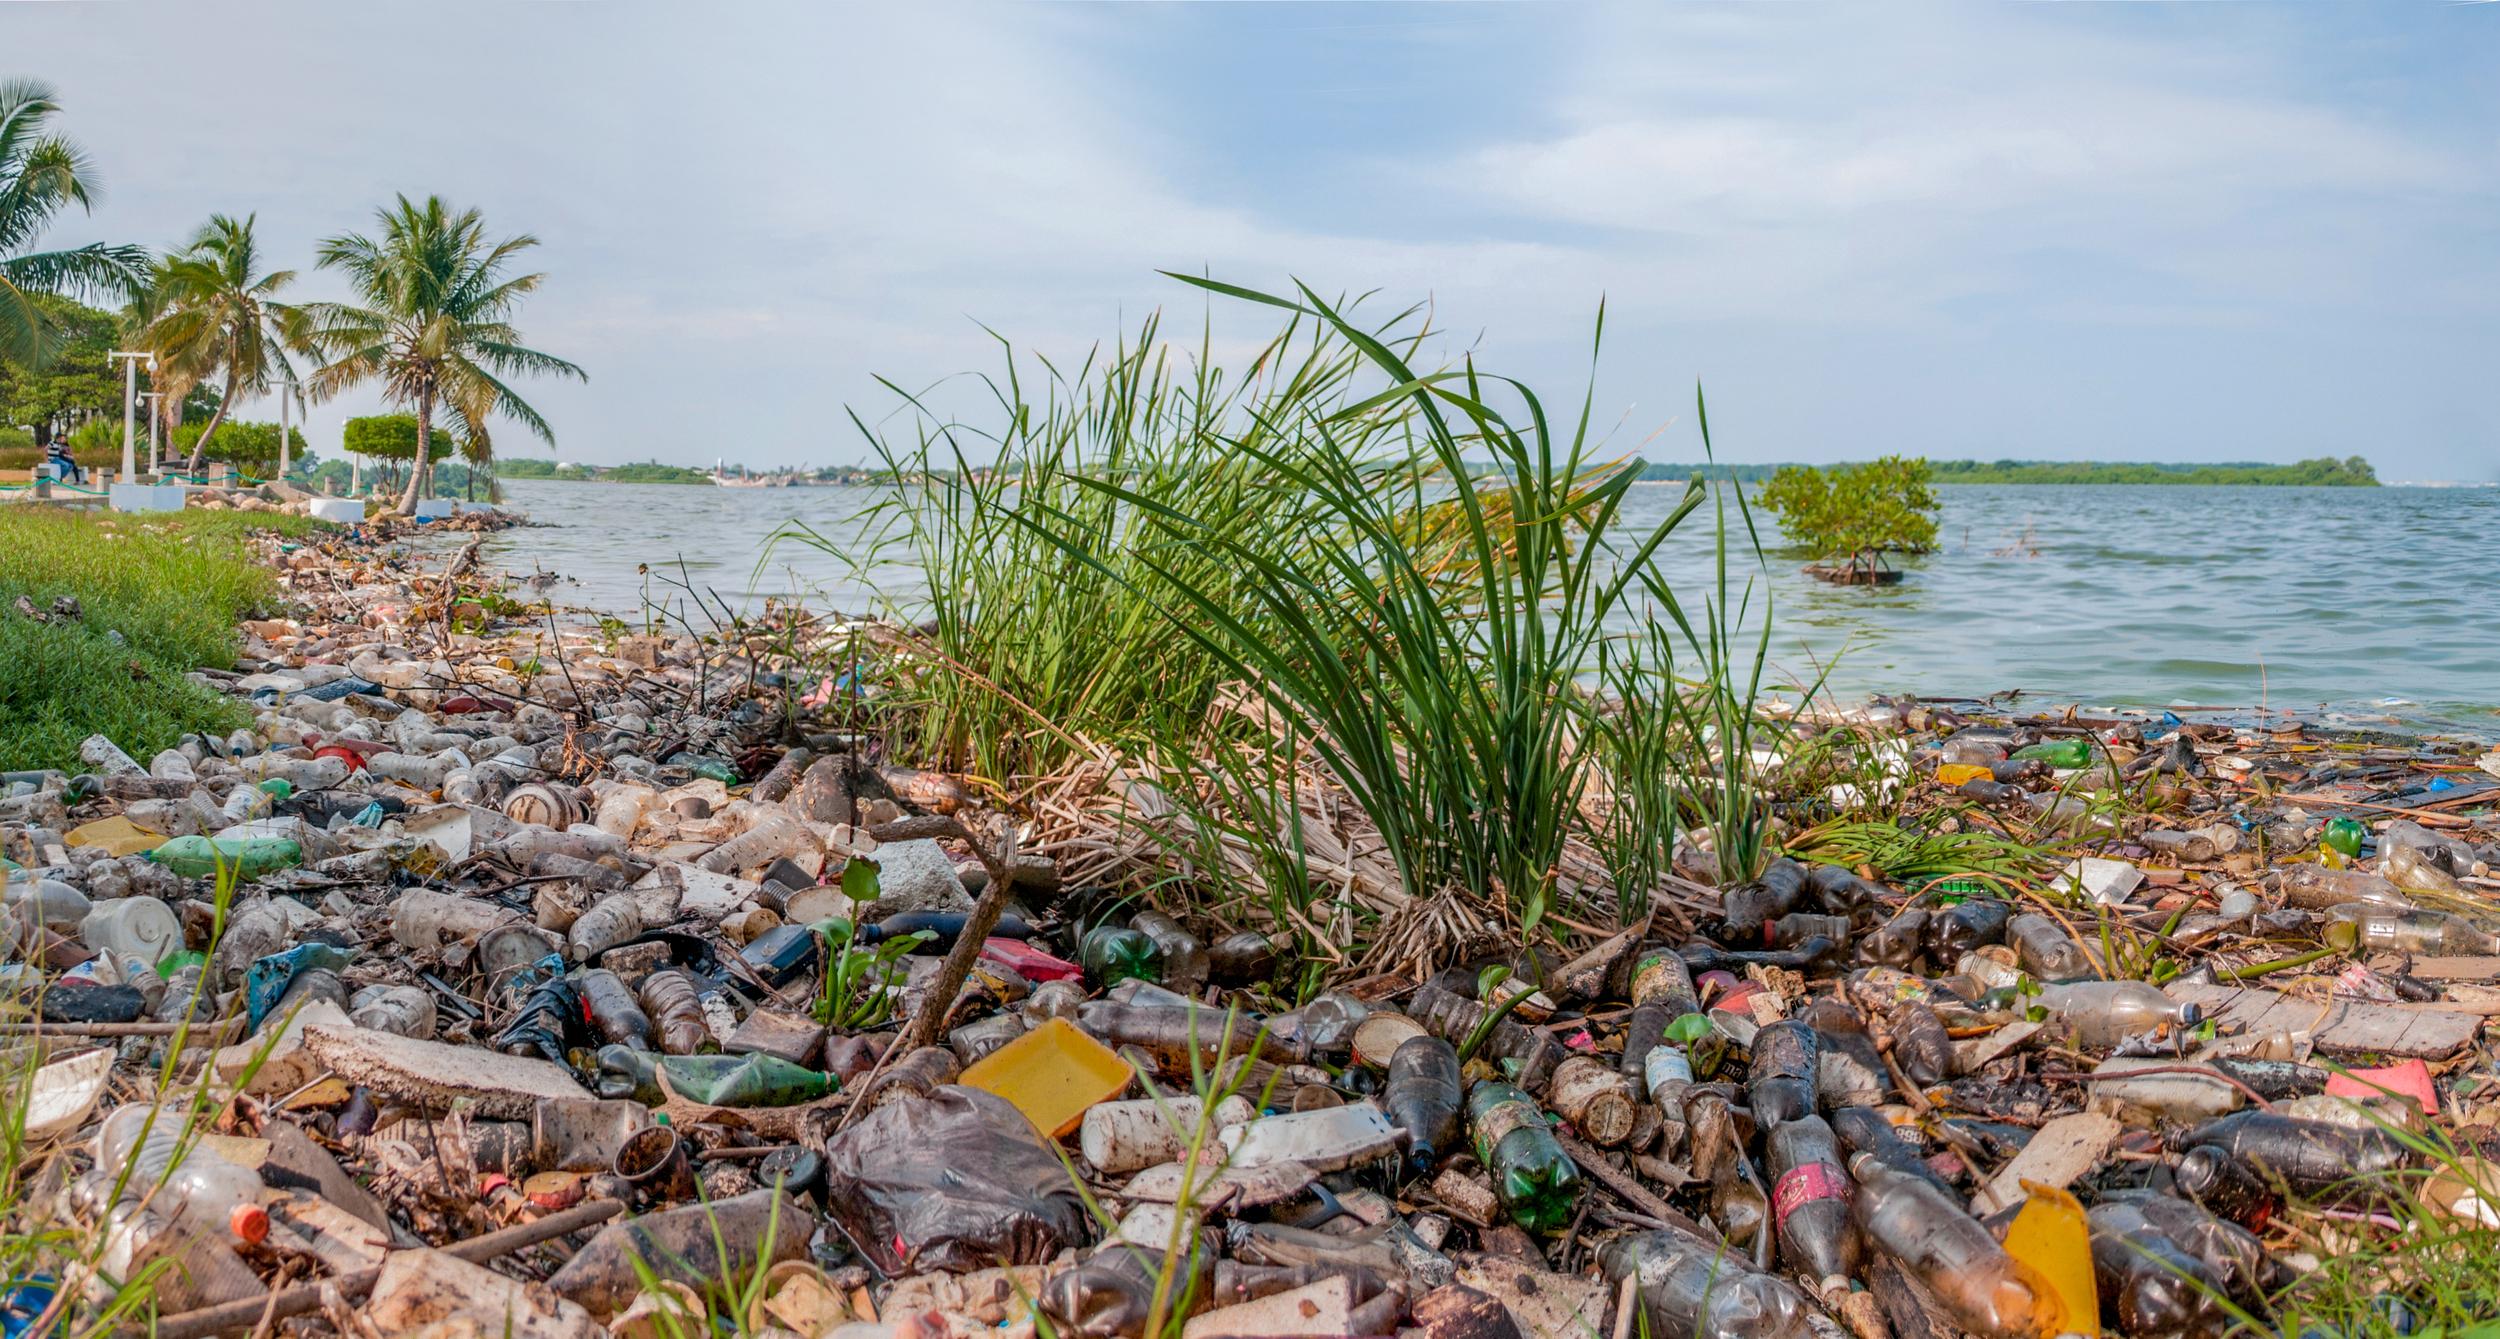 Pollution_in_Maracaibo_lake.jpg